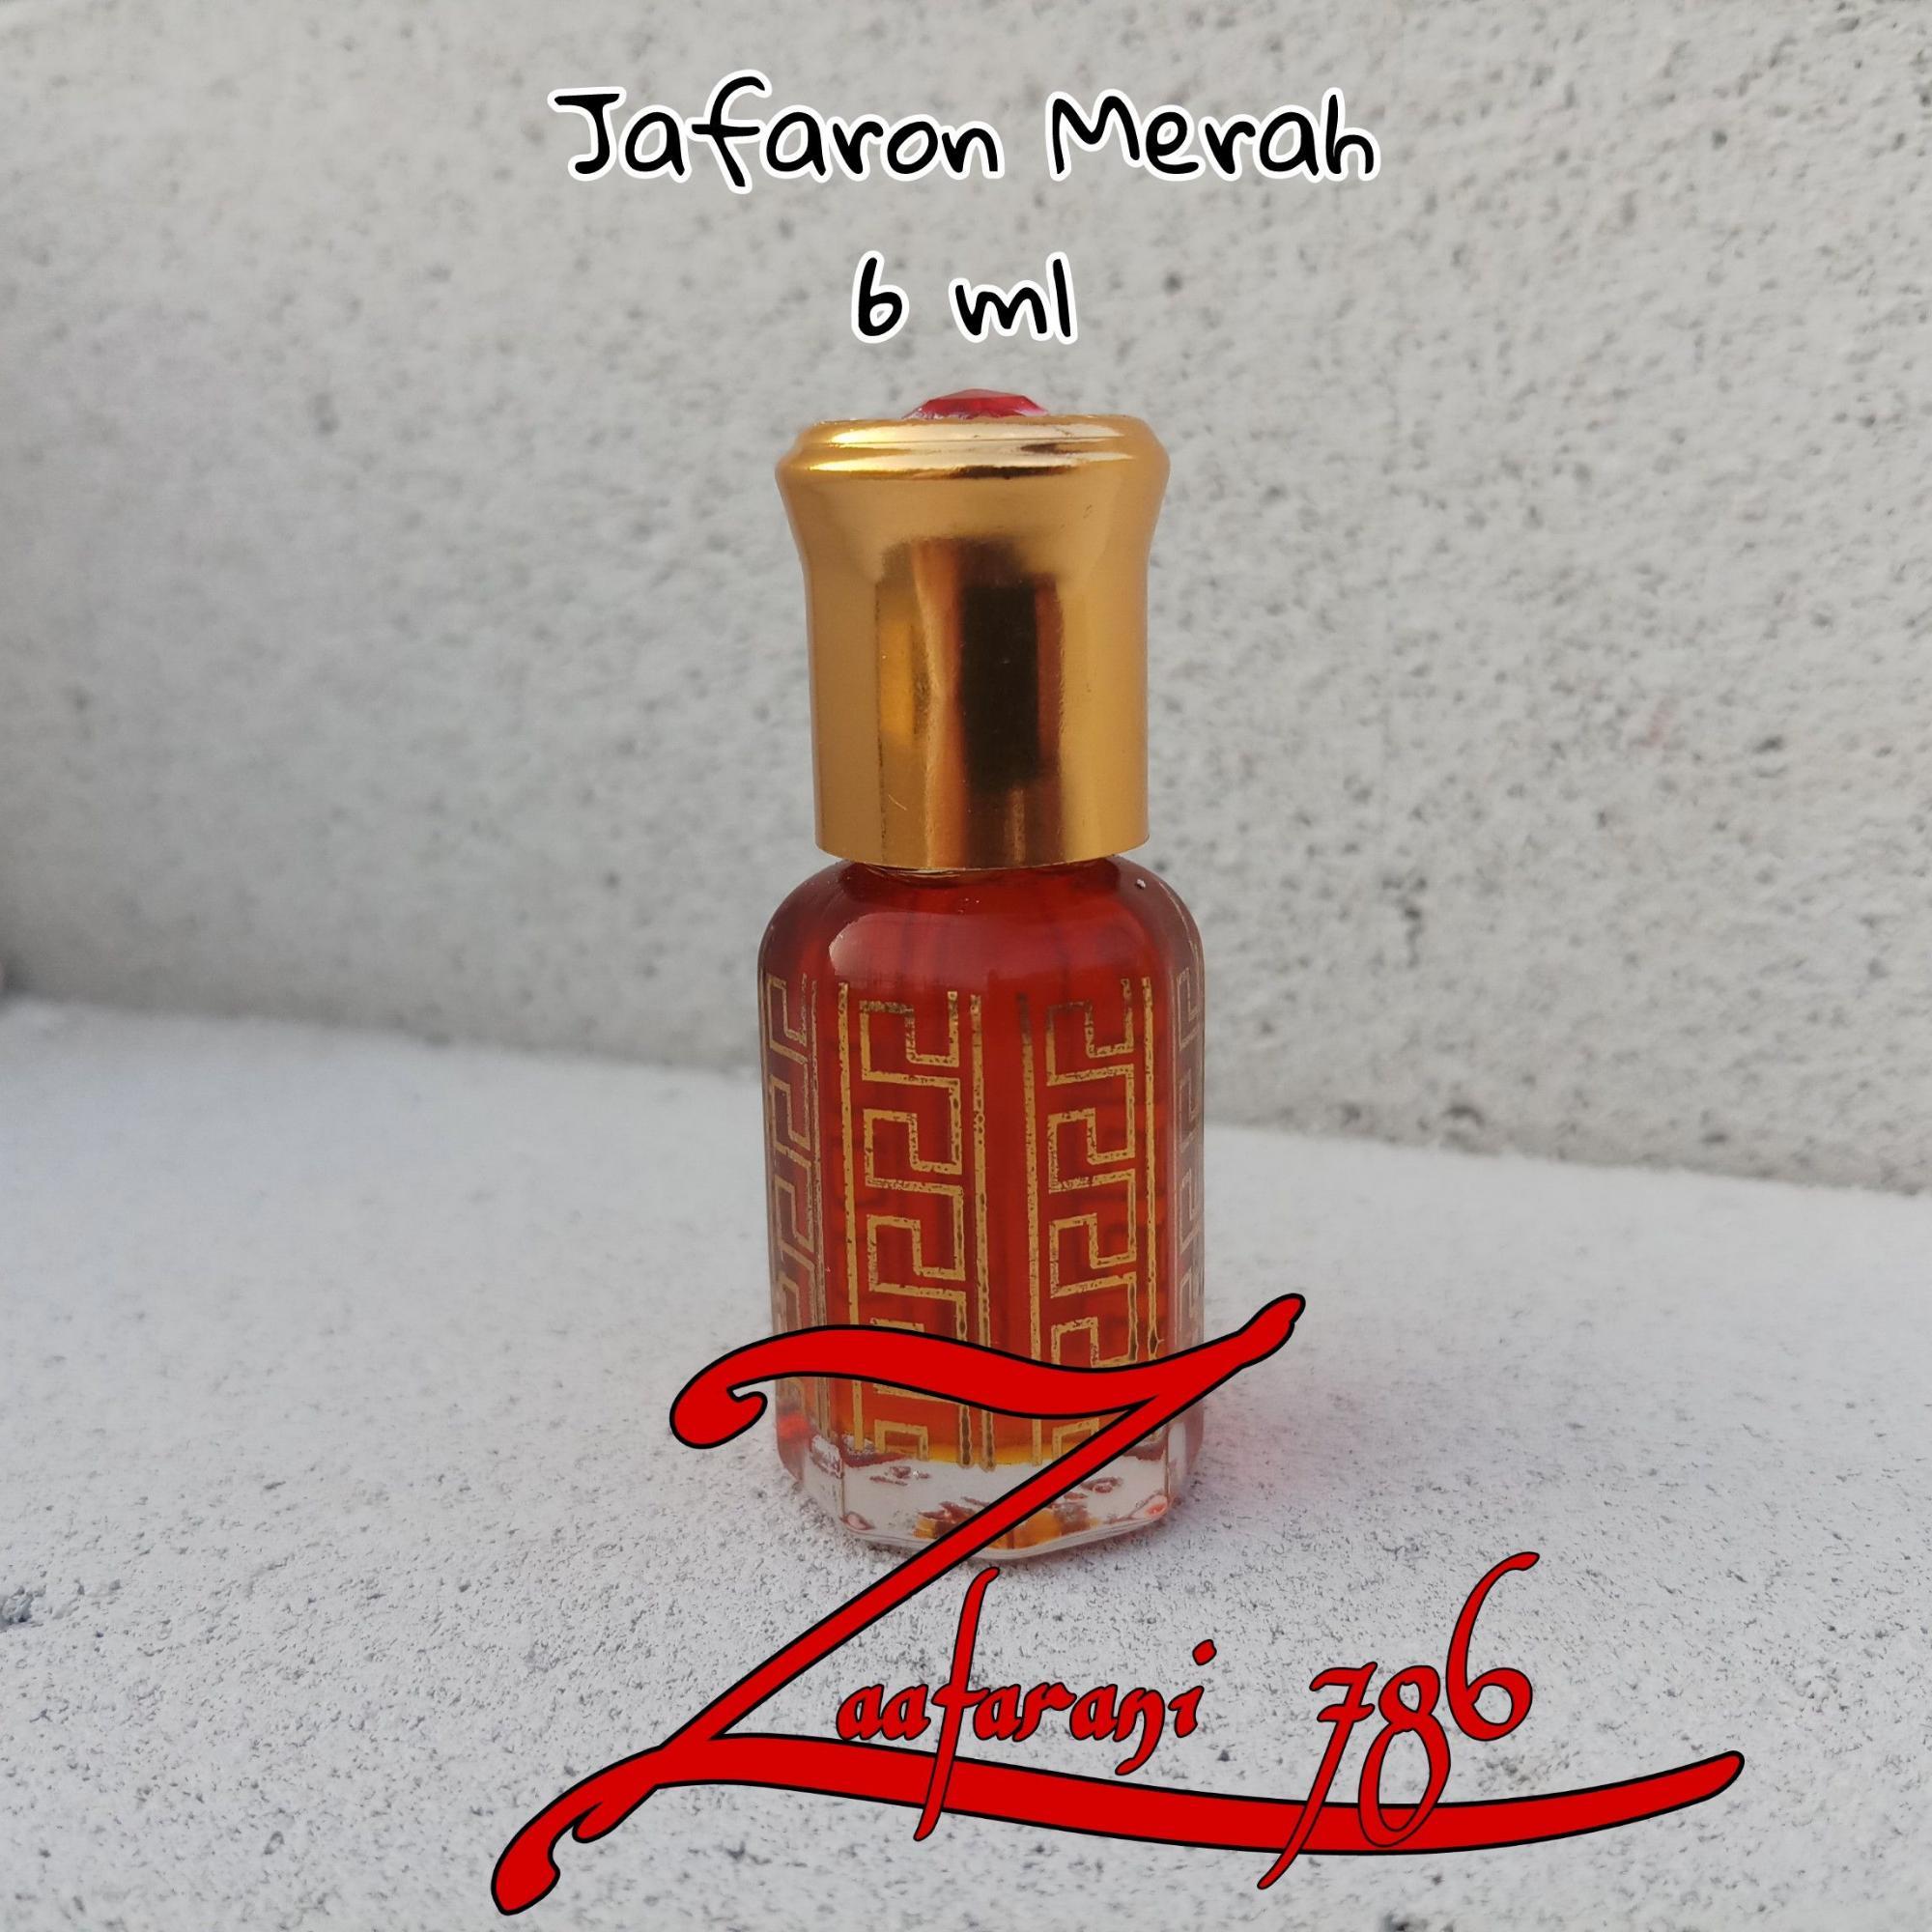 Minyak Jafaron Merah 6 ml ( Asli - Murni - Non Alkohol - Bibit - Asal Arab )